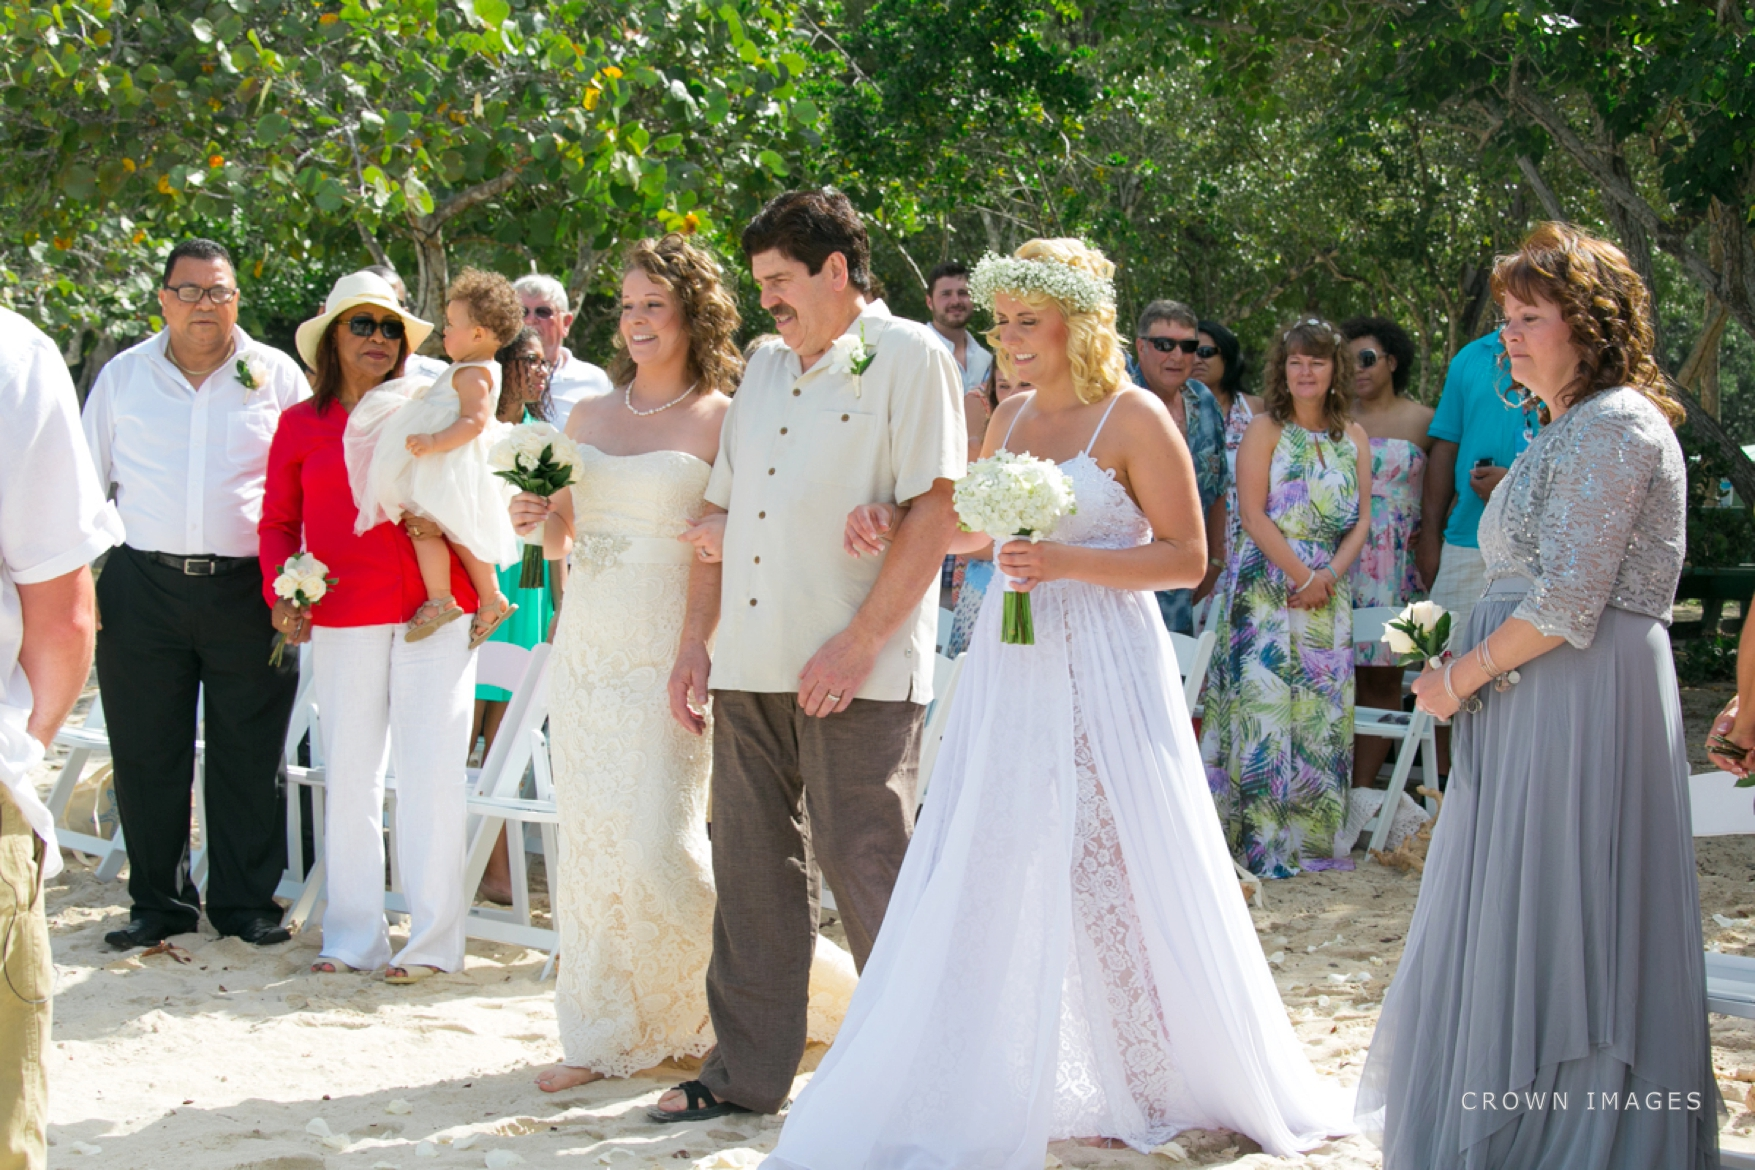 wedding_photos_saint_thomas_crown_images_0571.jpg